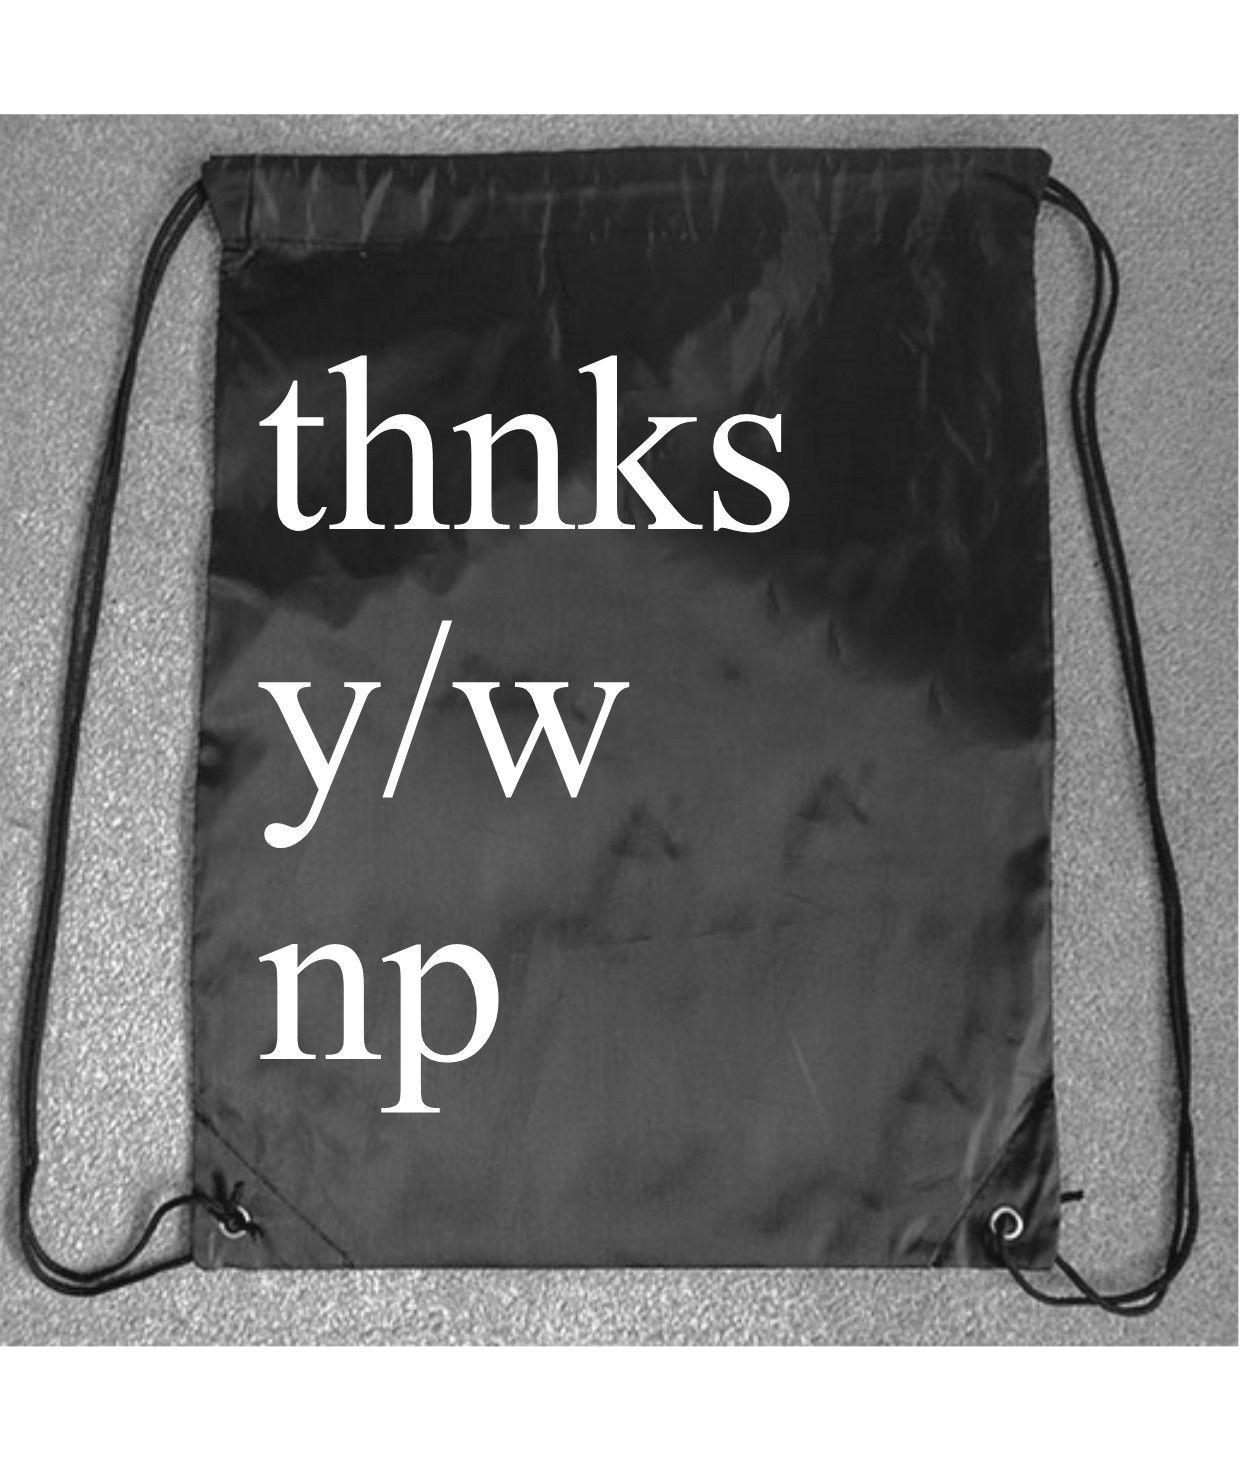 np text slang